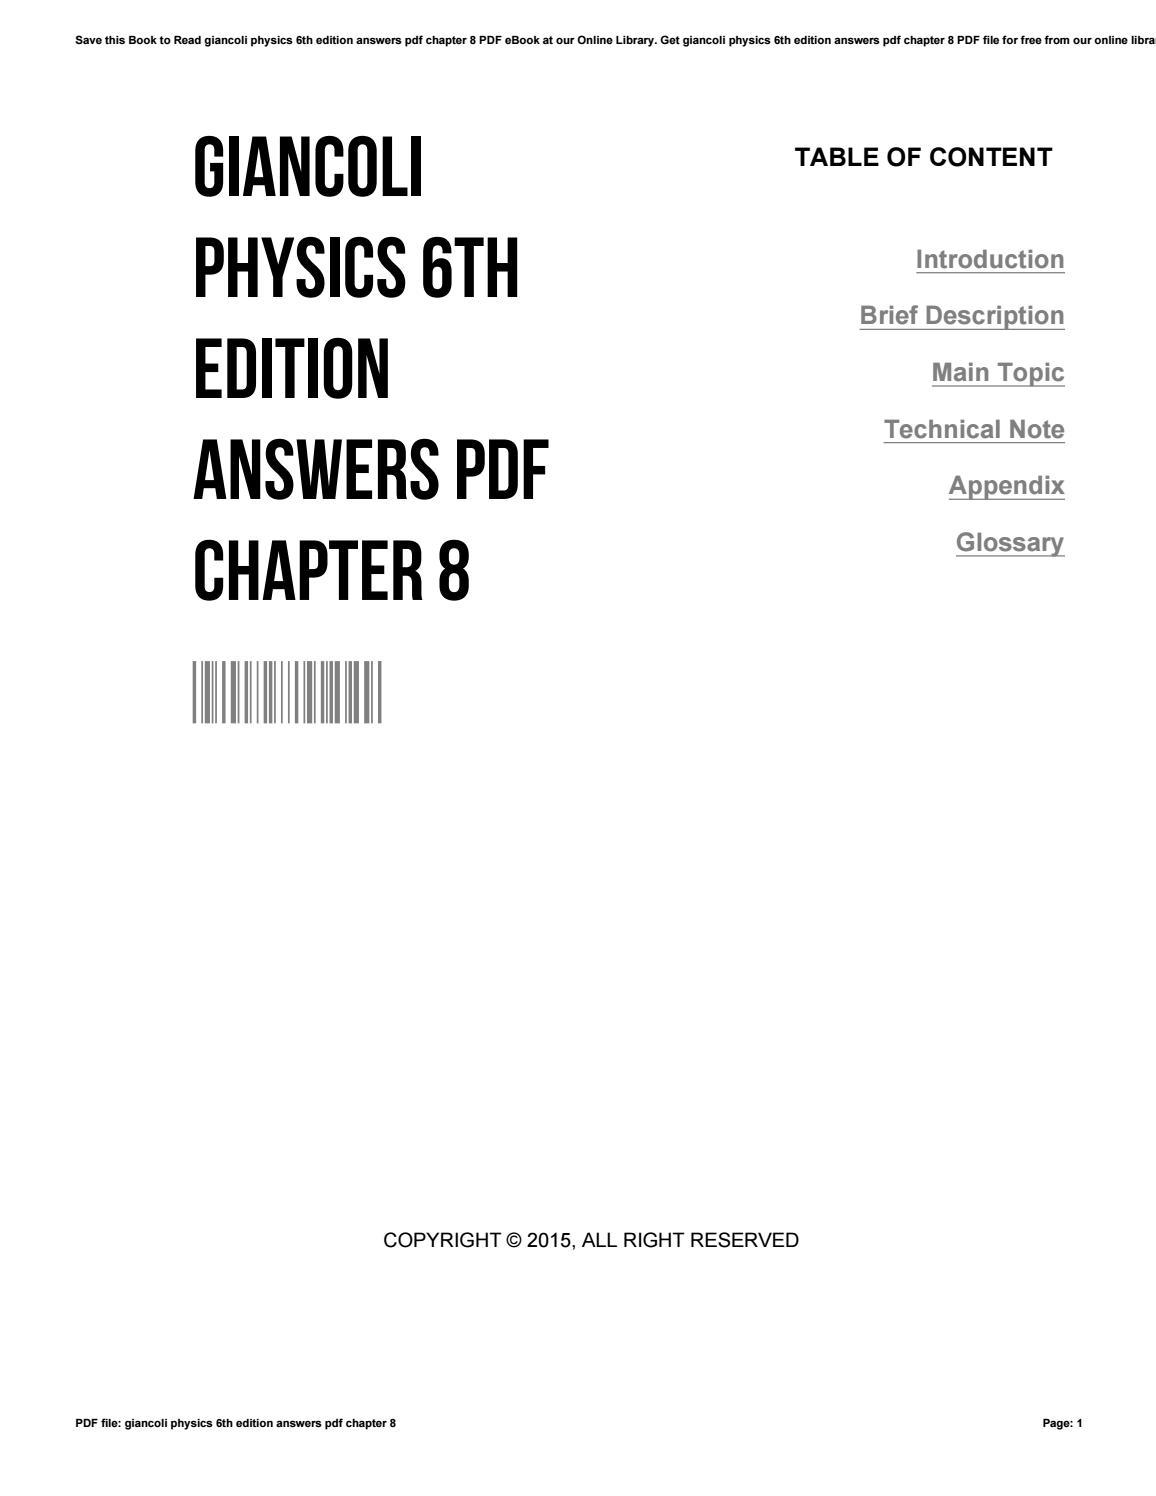 Giancoli Physics 6th Edition Pdf Answers